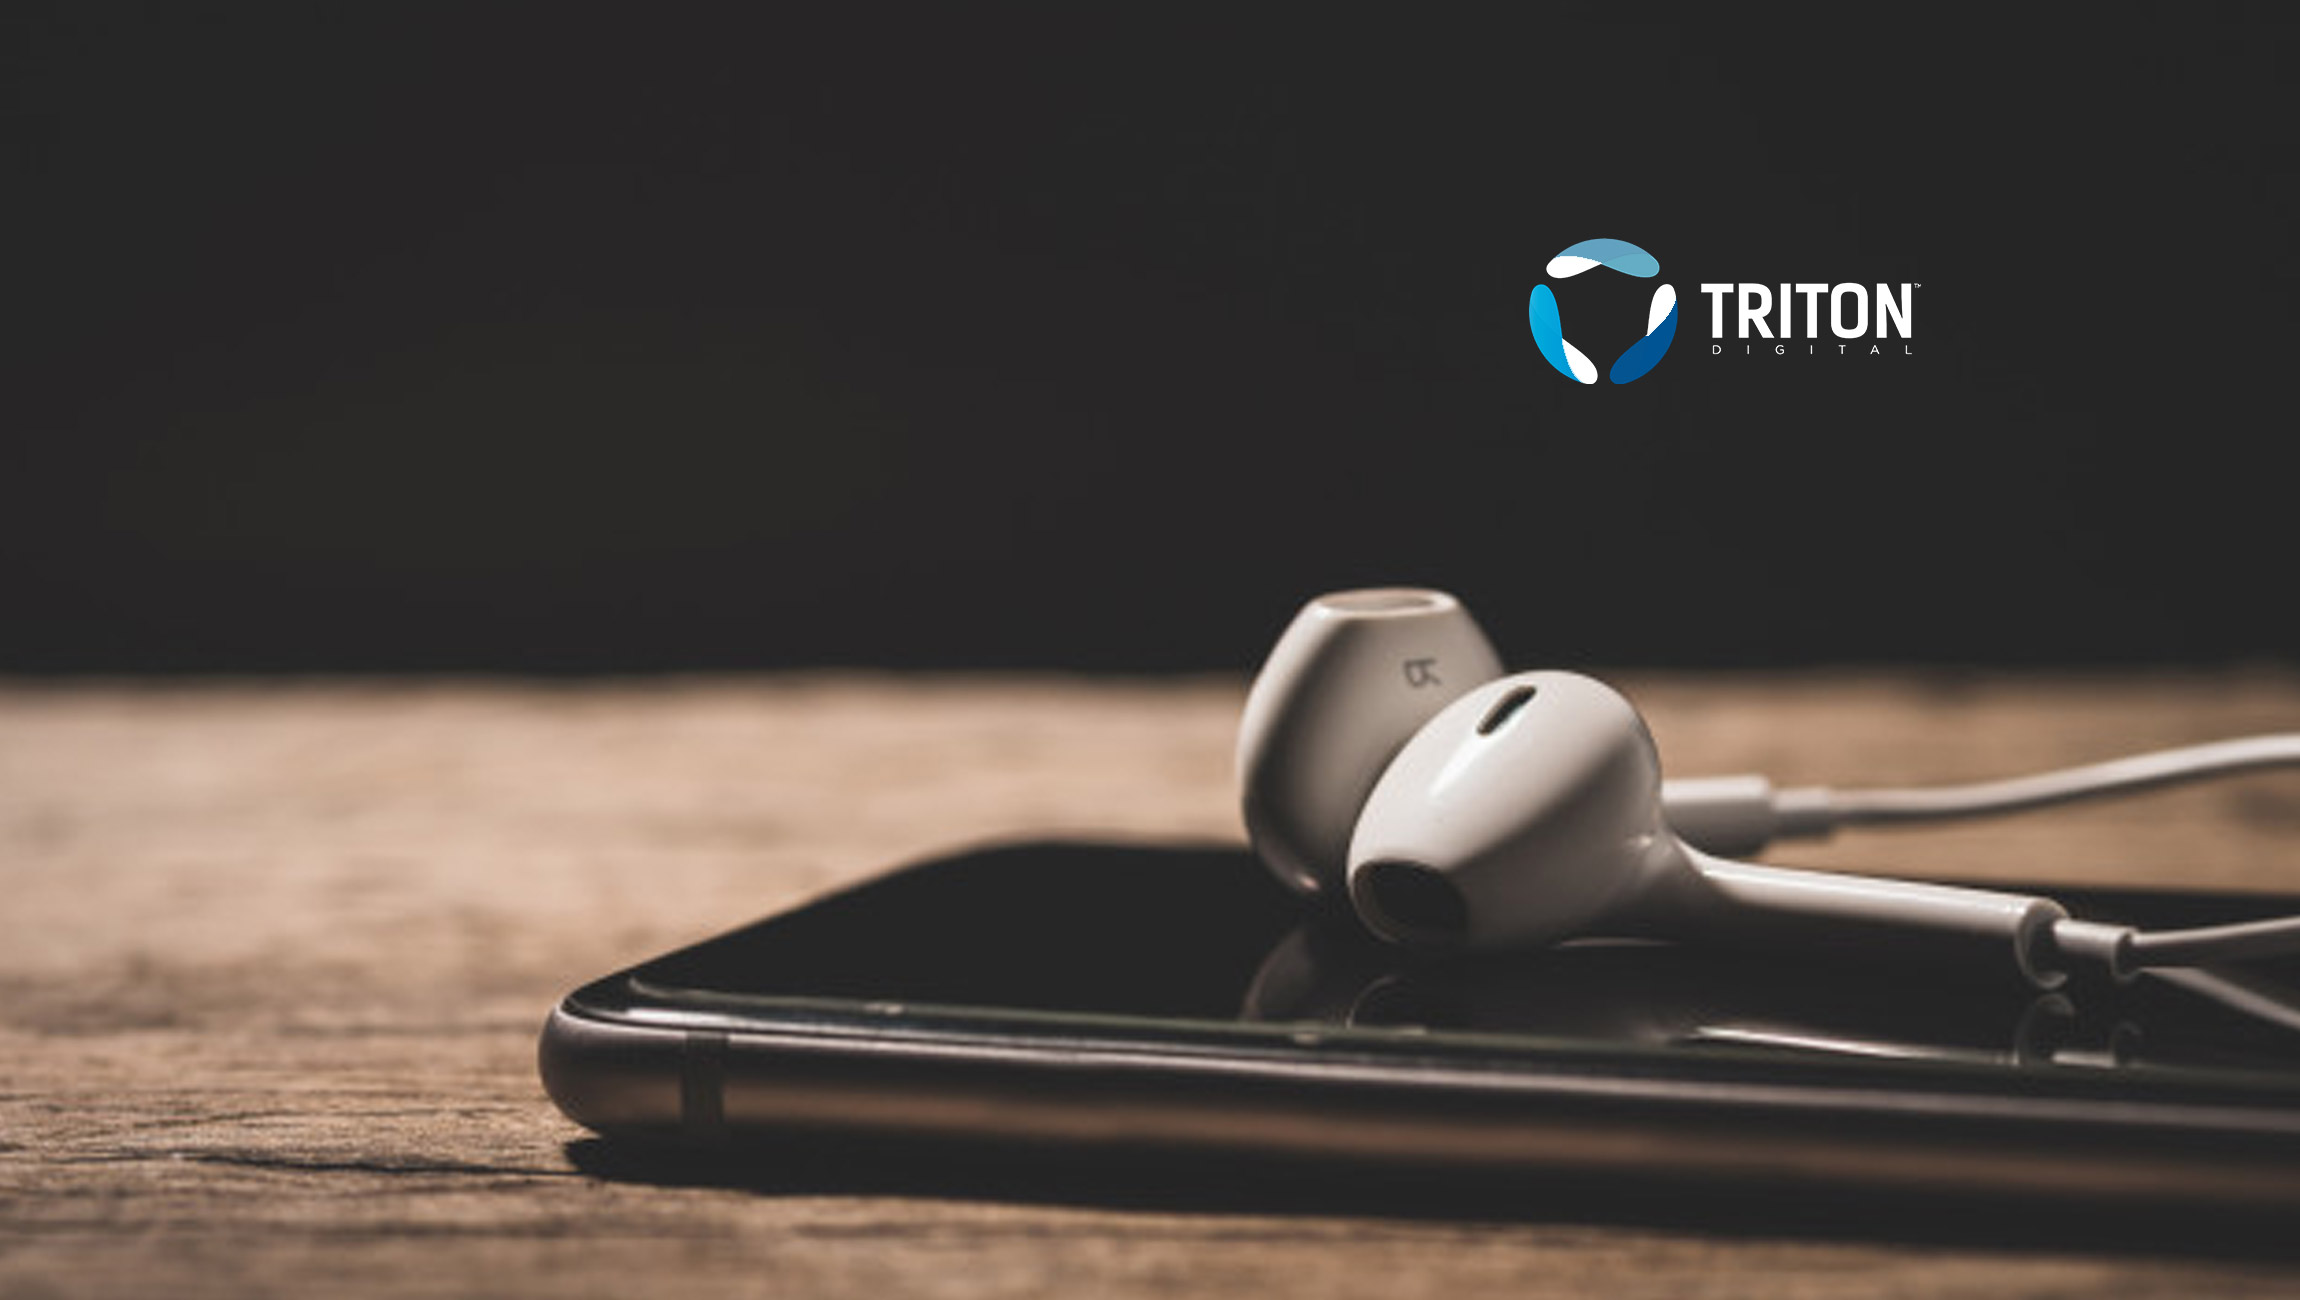 Triton Digital Announces Acquisition of Podcast Powerhouse Omny Studio